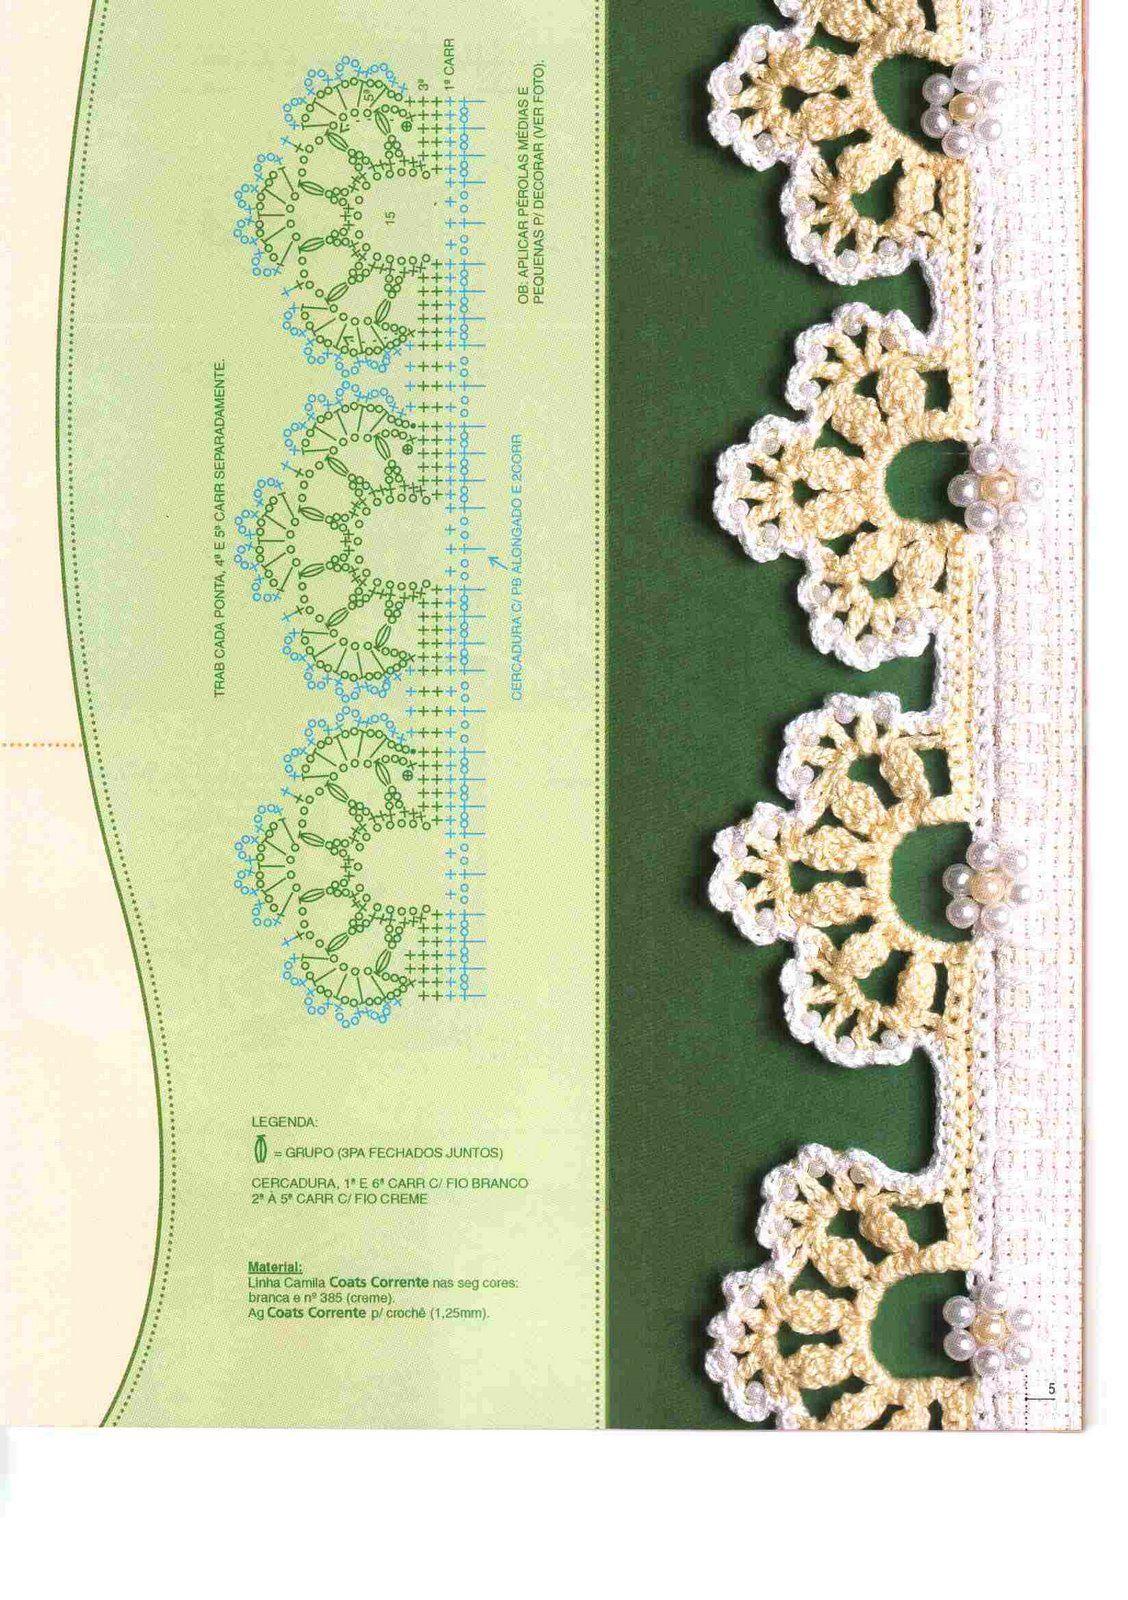 crochet edging | Crochet: BORDERS | Pinterest | Flor, Ganchillo y Tejido